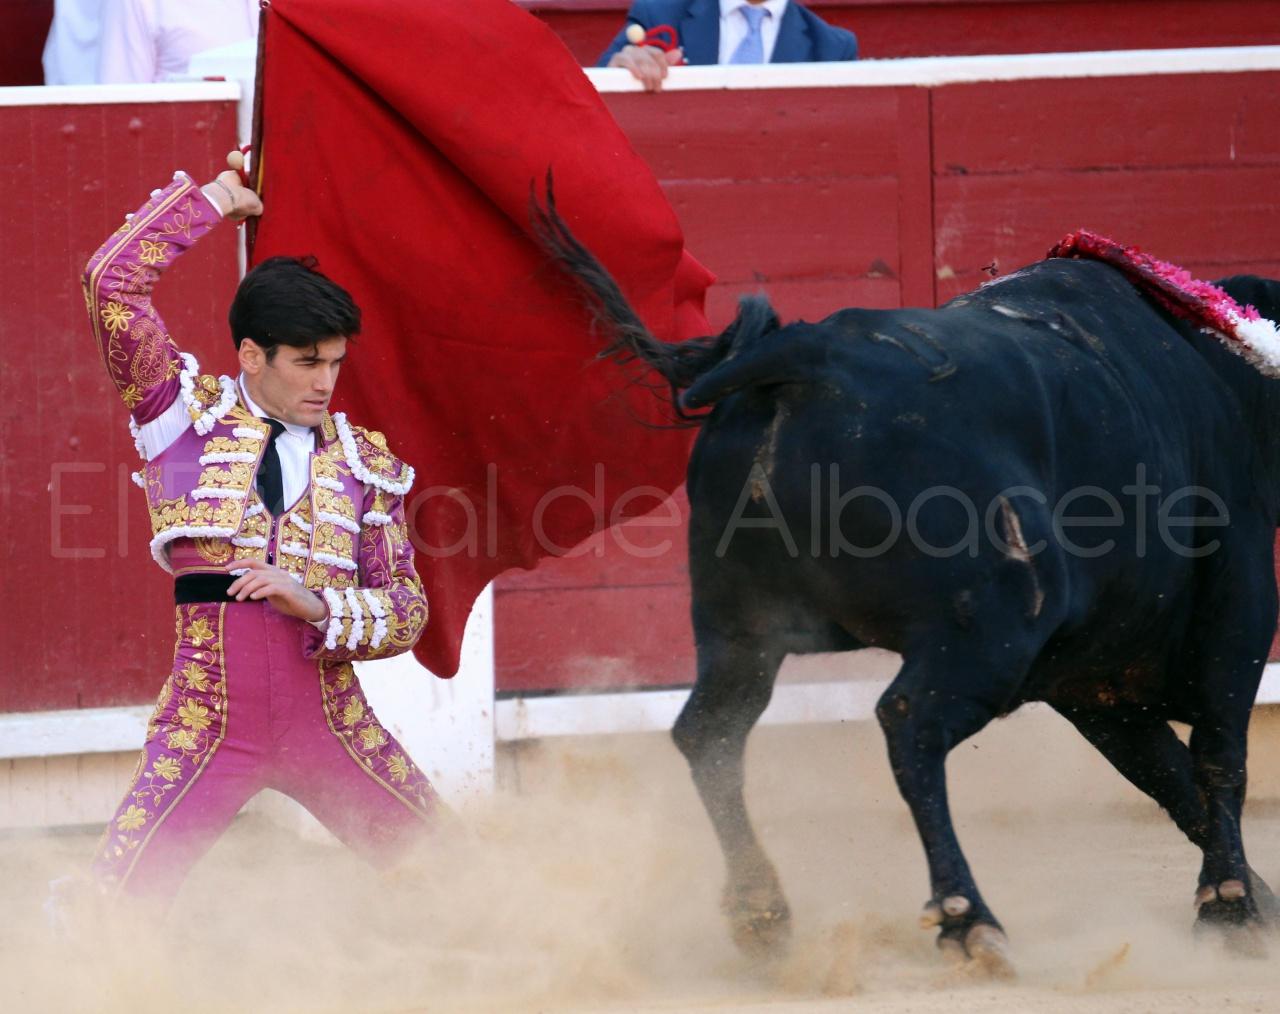 El Juli Lopez Simon y Garrido Feria Albacete 2015 toros  65